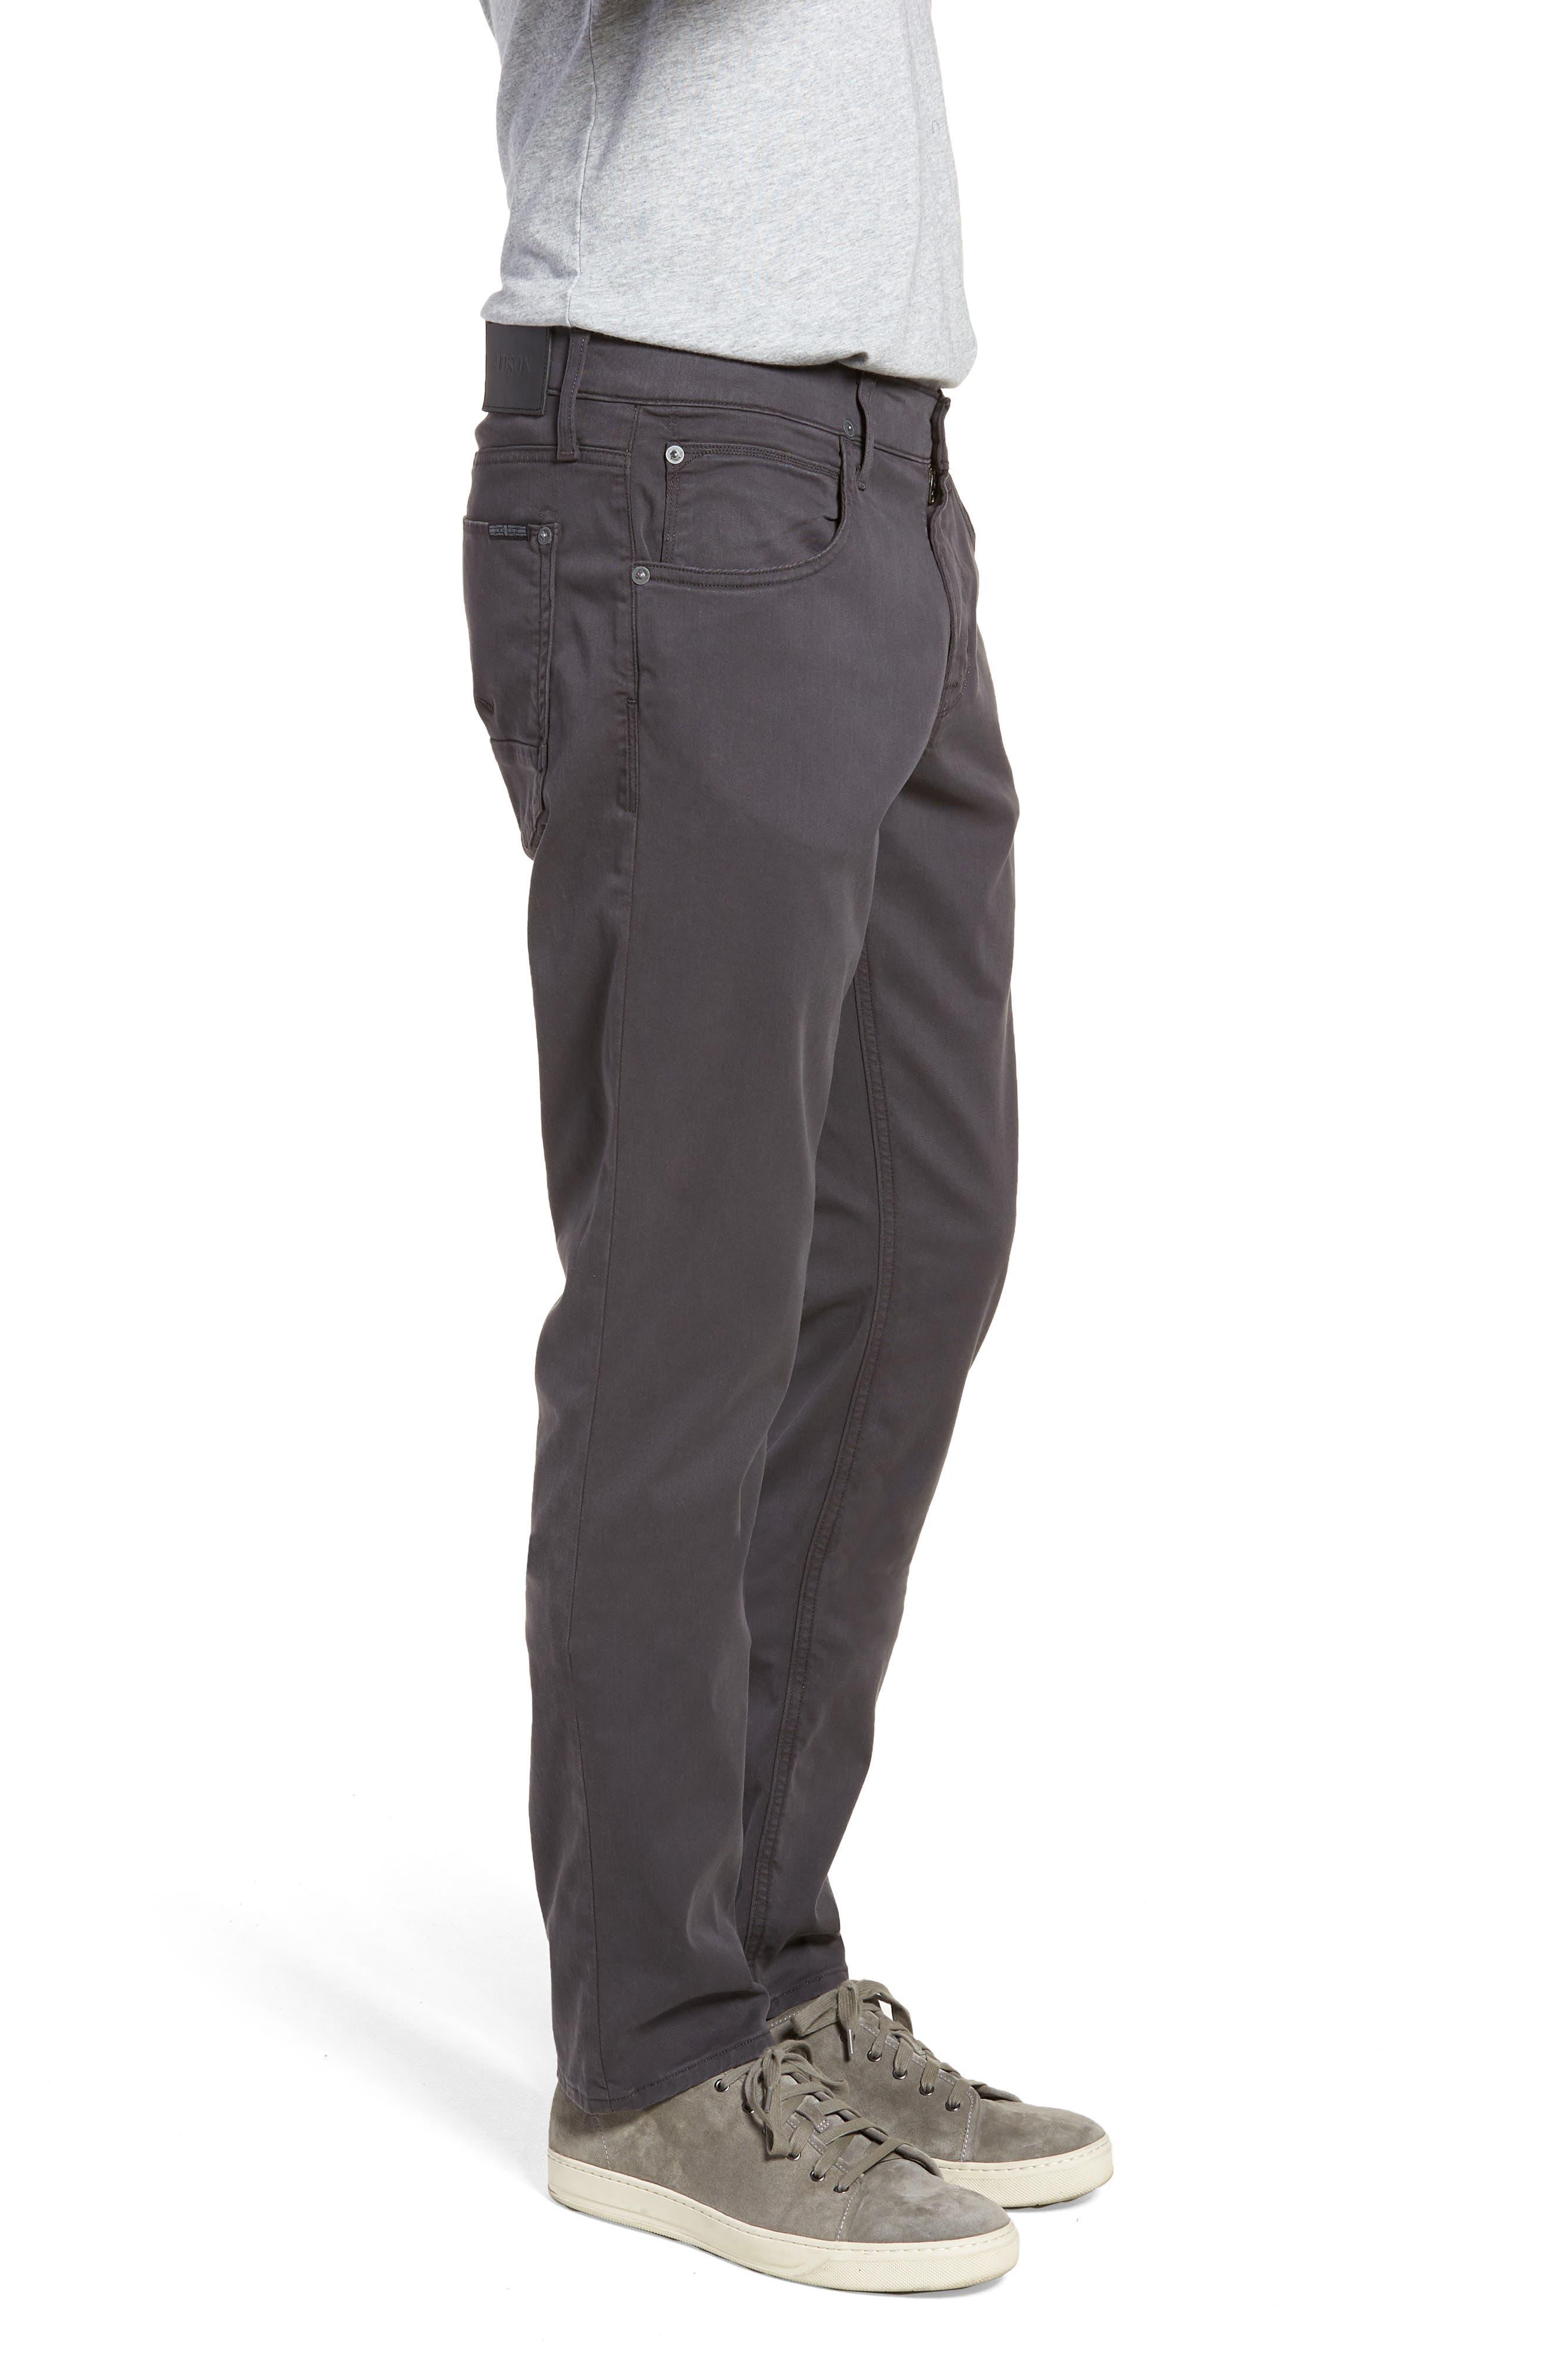 Blake Slim Fit Jeans,                             Alternate thumbnail 3, color,                             Metal